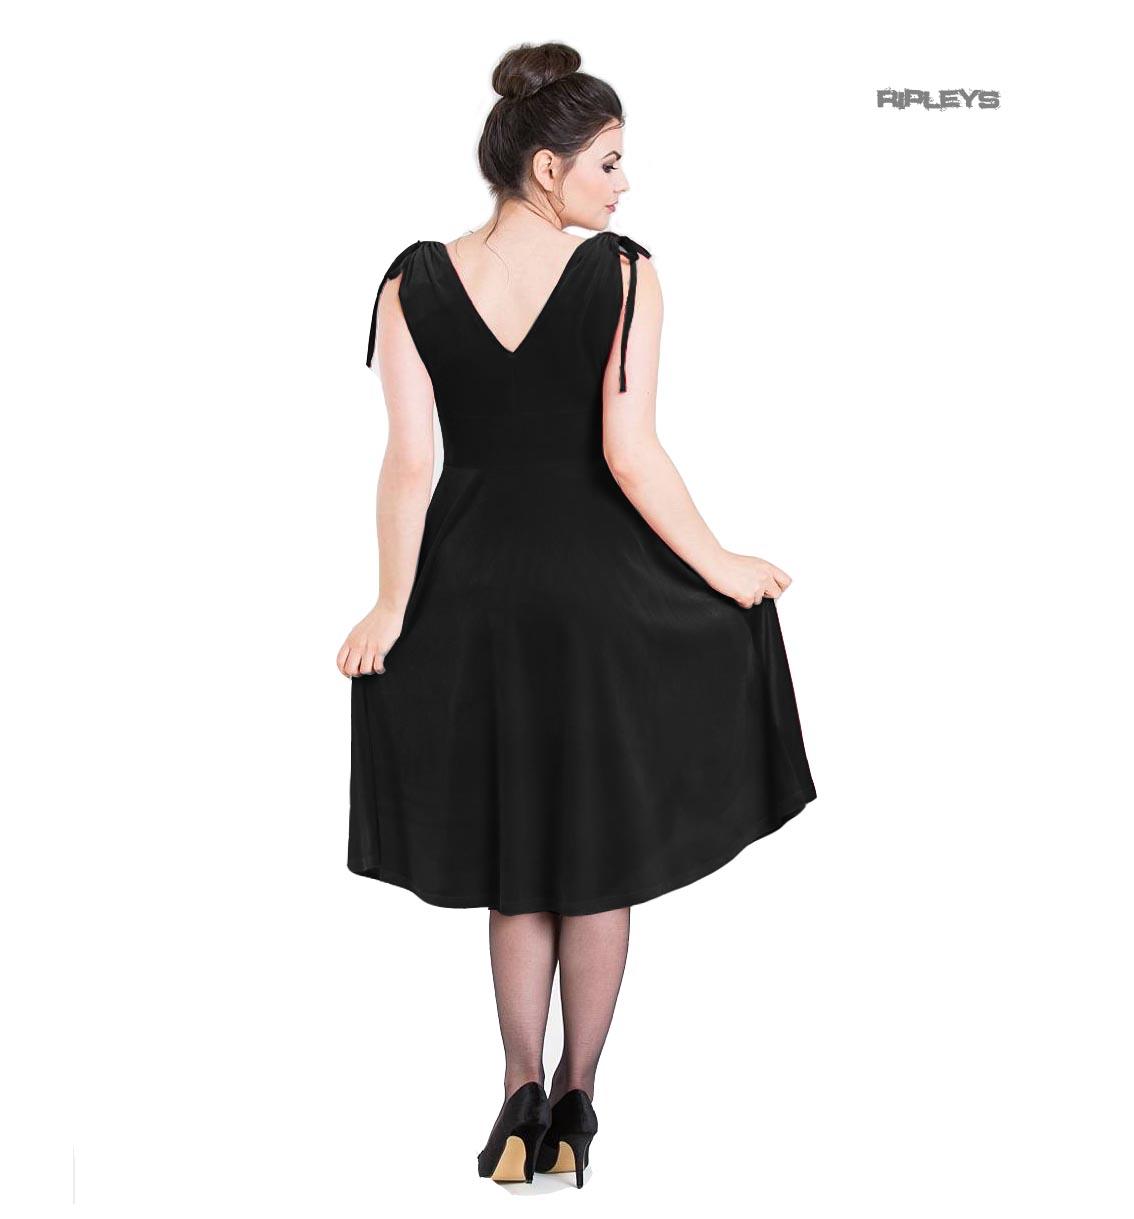 Hell-Bunny-40s-50s-Elegant-Pin-Up-Dress-MELINA-Crushed-Velvet-Black-All-Sizes thumbnail 4